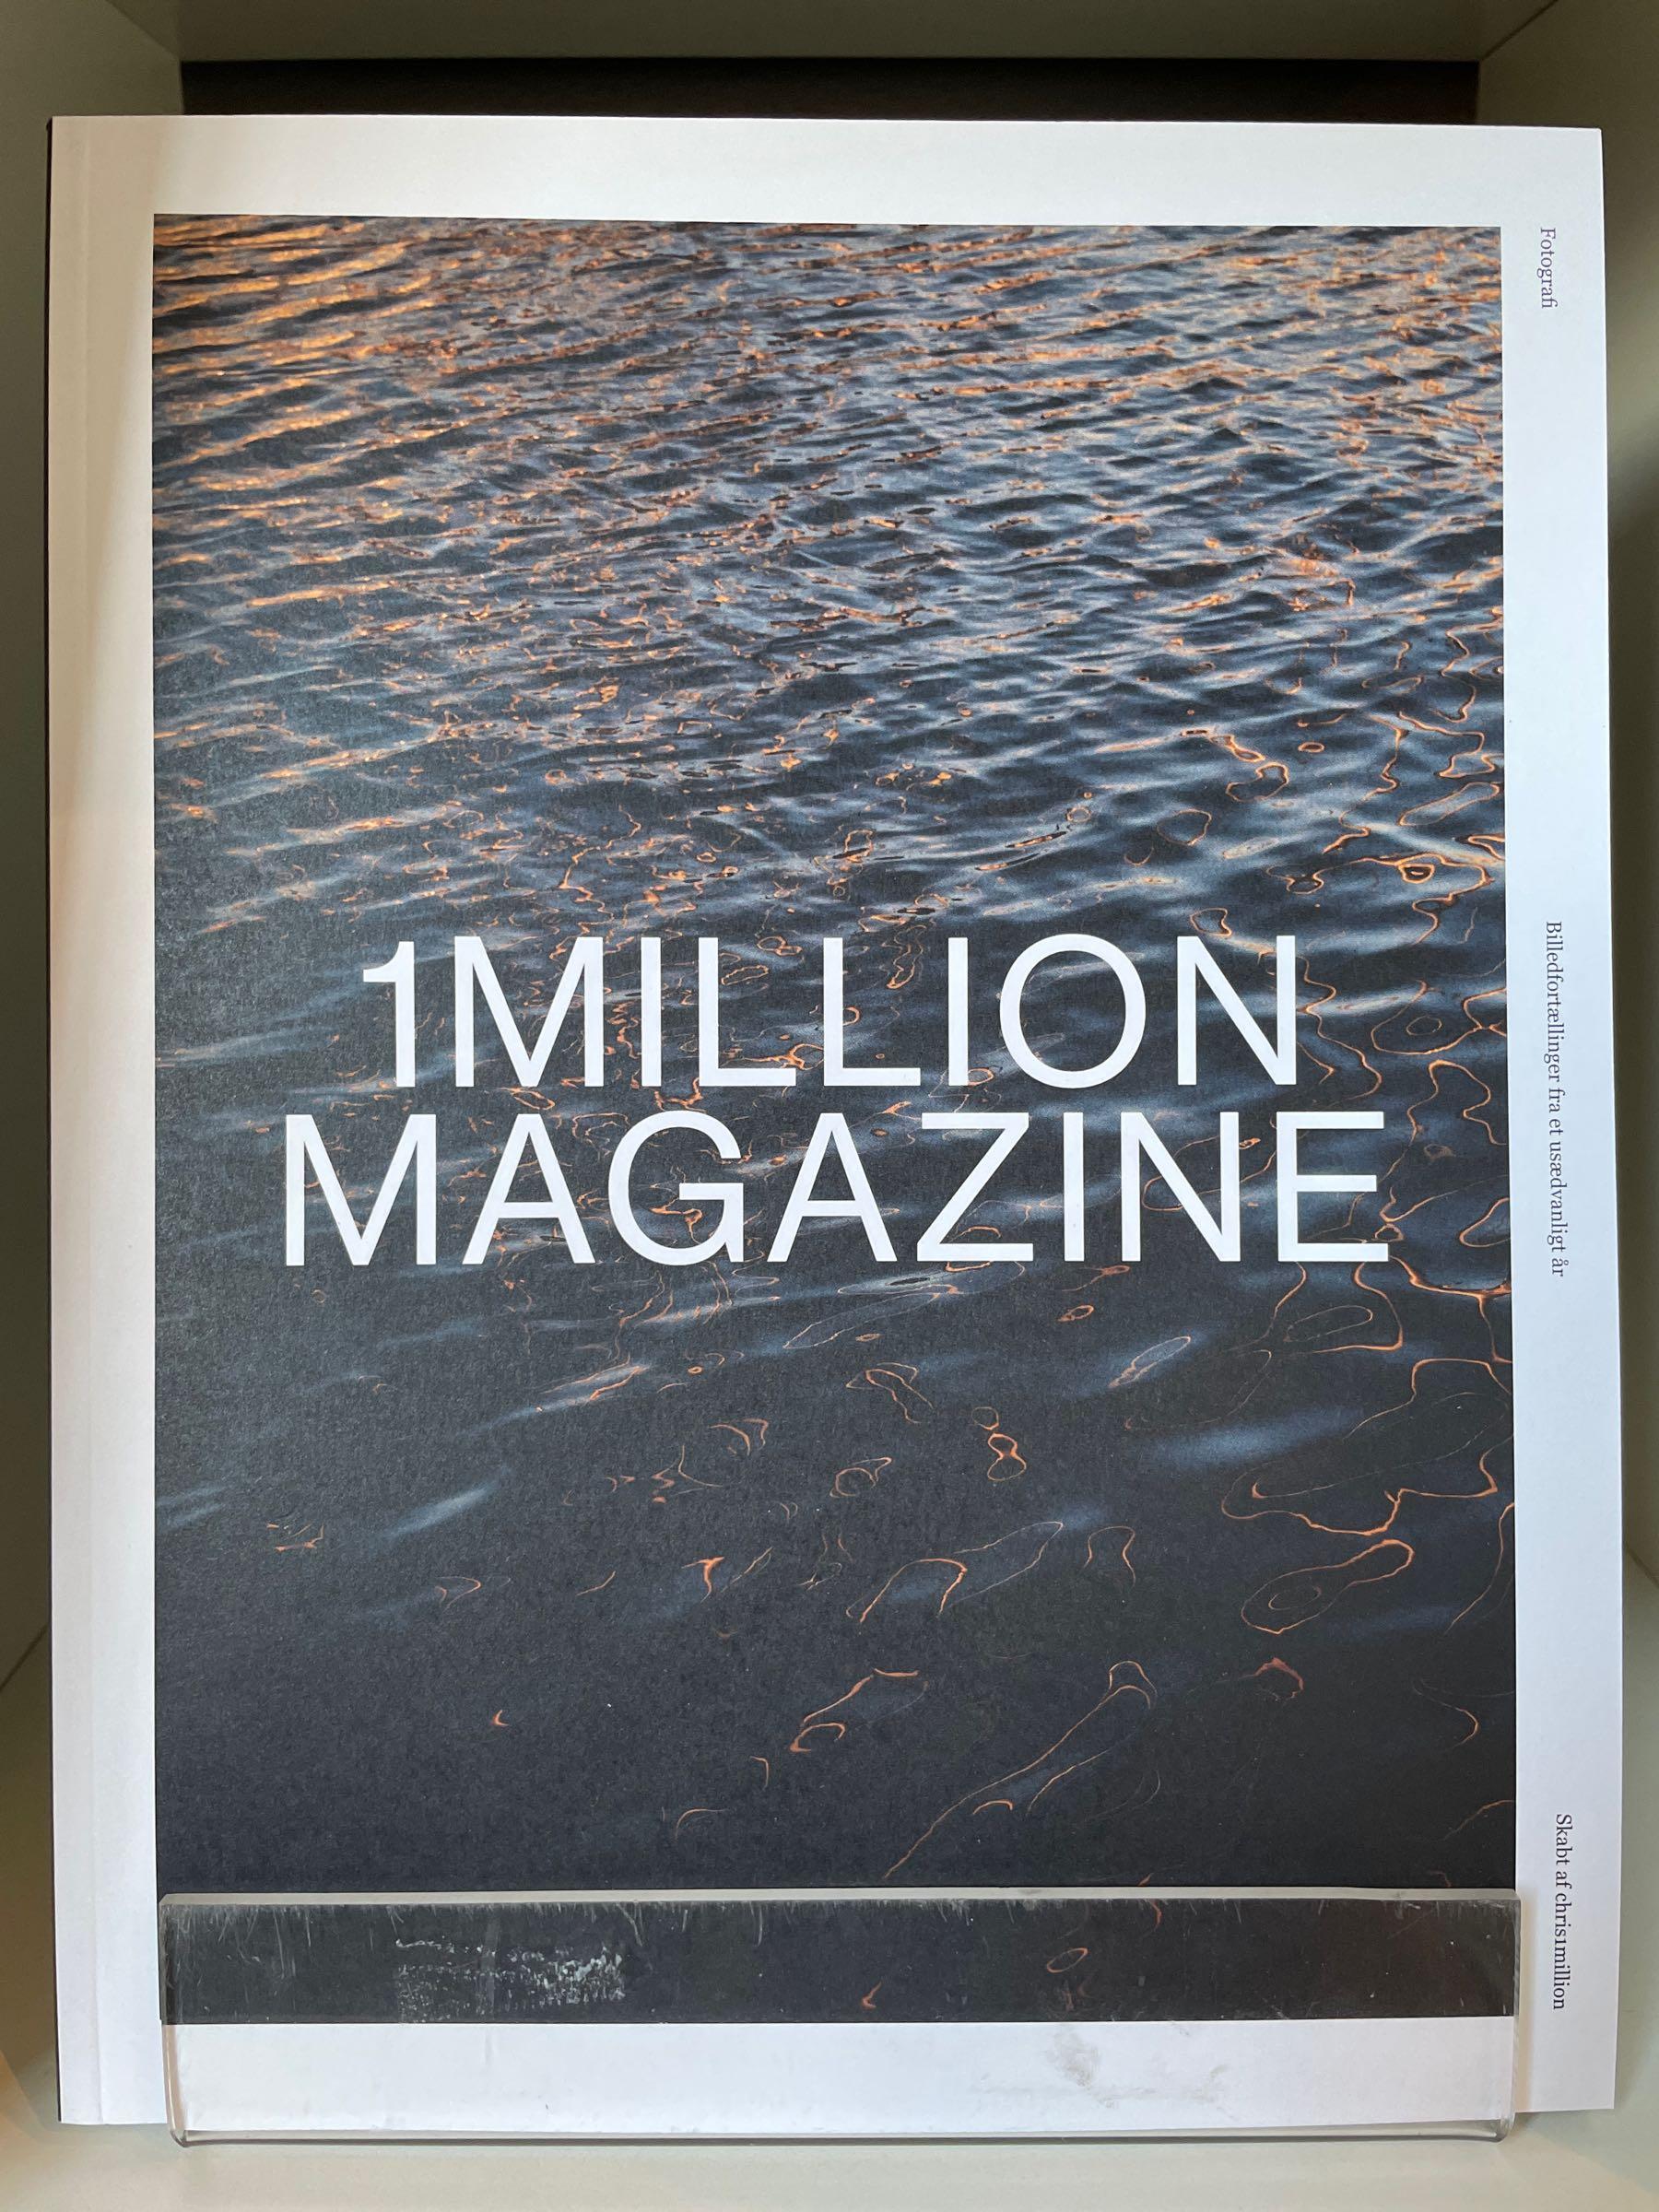 1 MILLION MAGAZINE